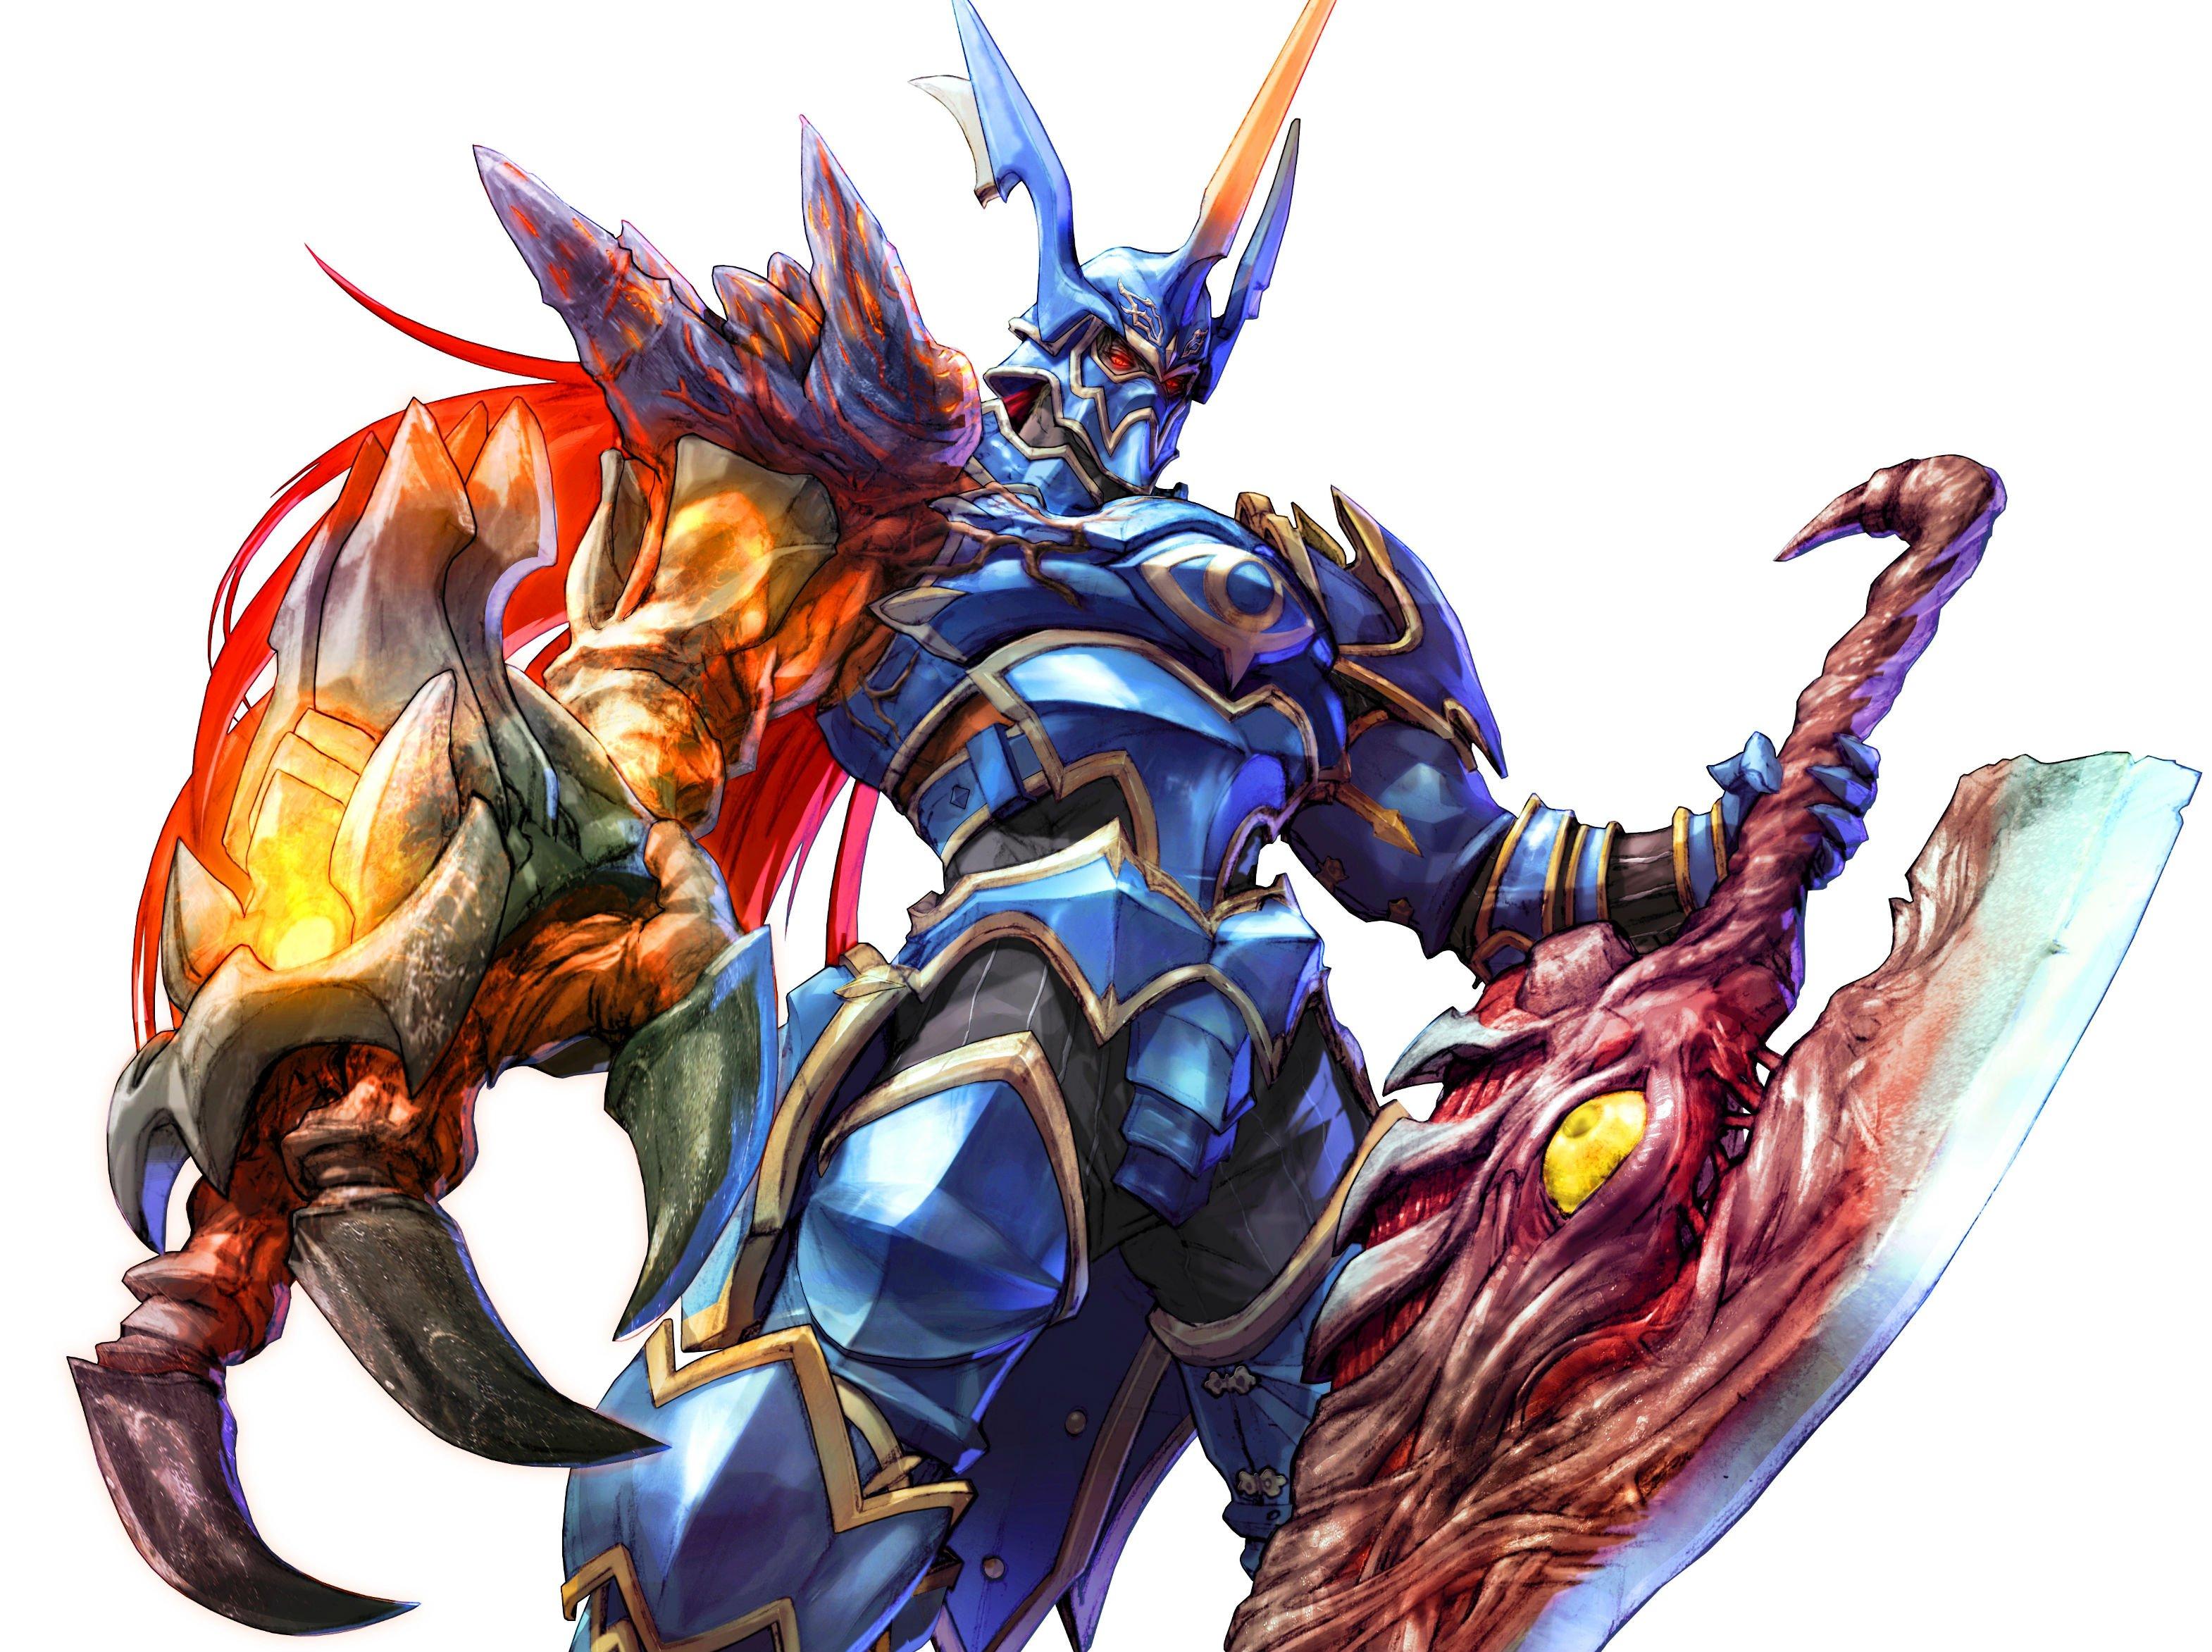 Soul calibur fantasy warrior game anime 15 wallpaper - Soul calibur wallpaper ...